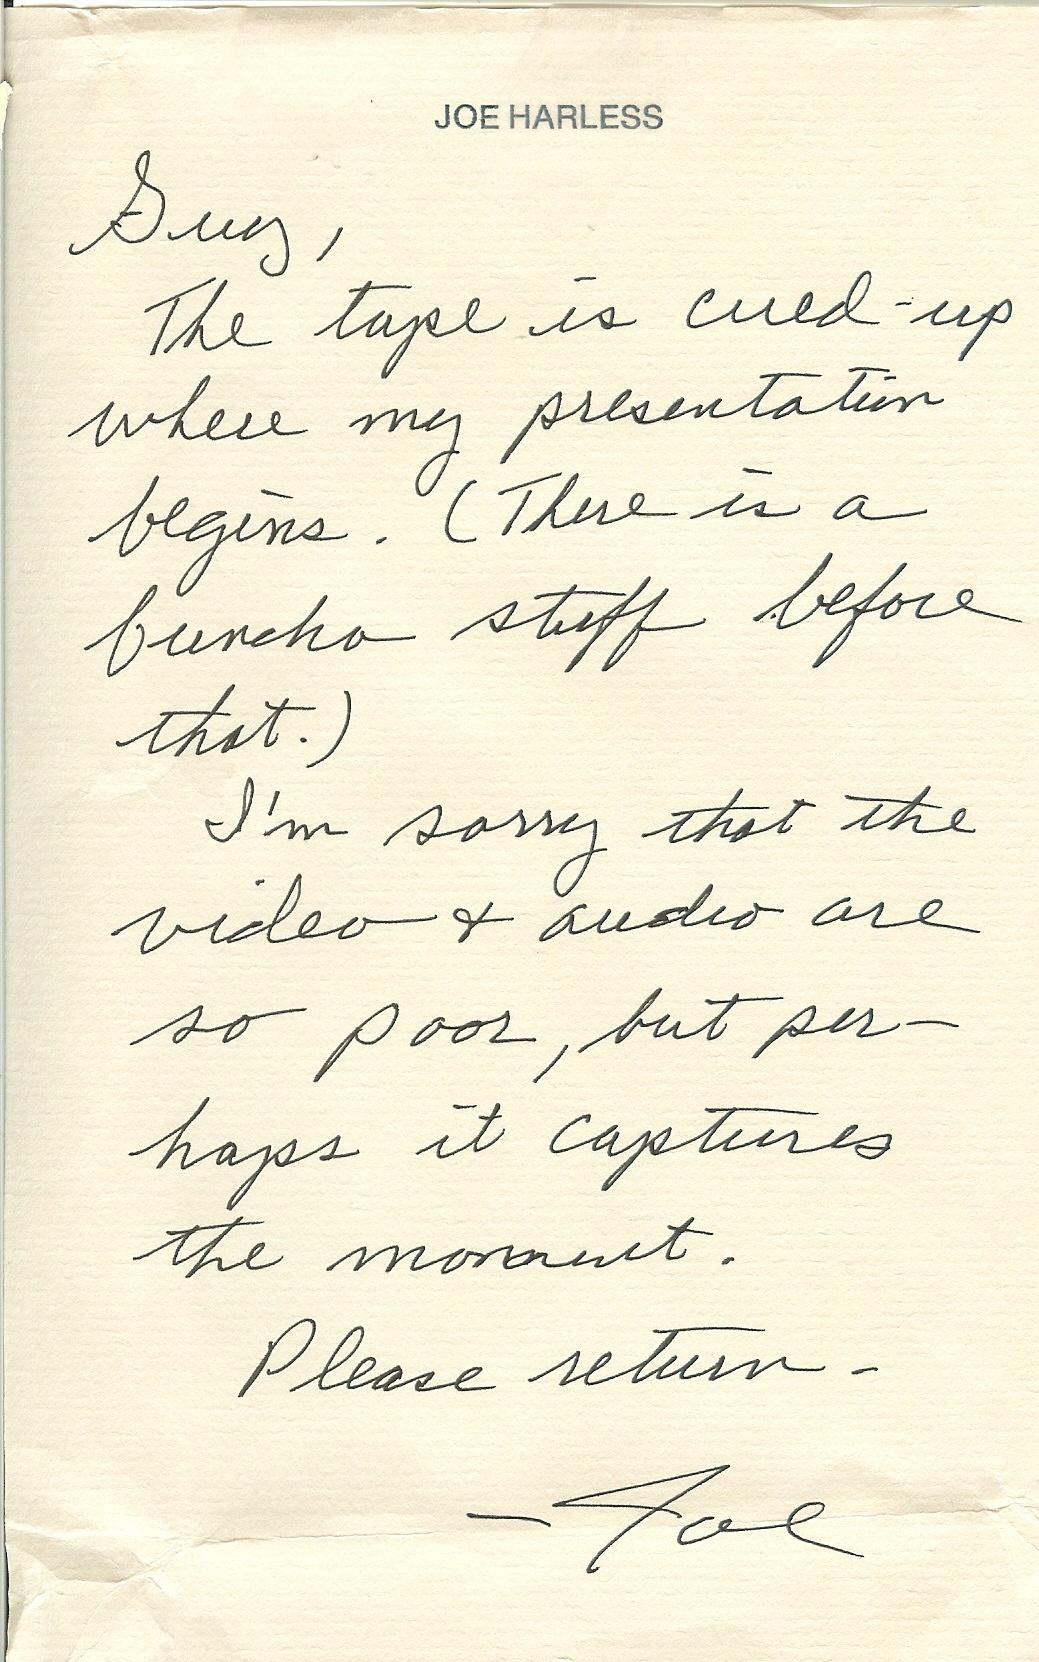 Note from Joe Harless re Wizard Tape